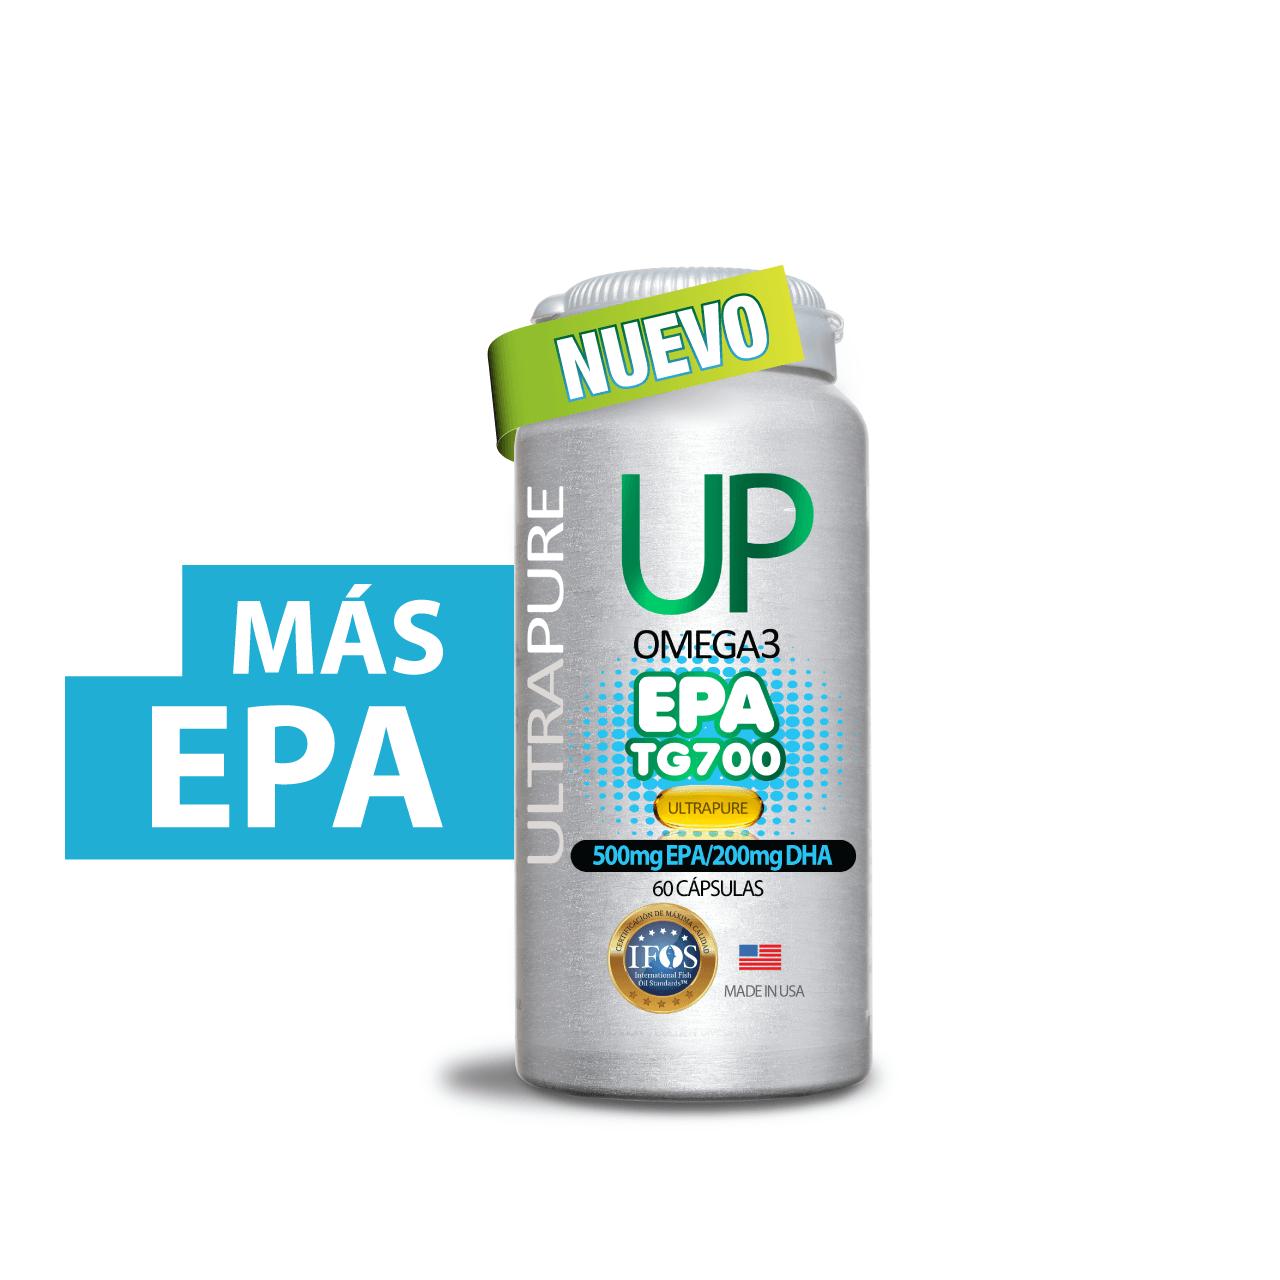 Omega Up 700 EPA